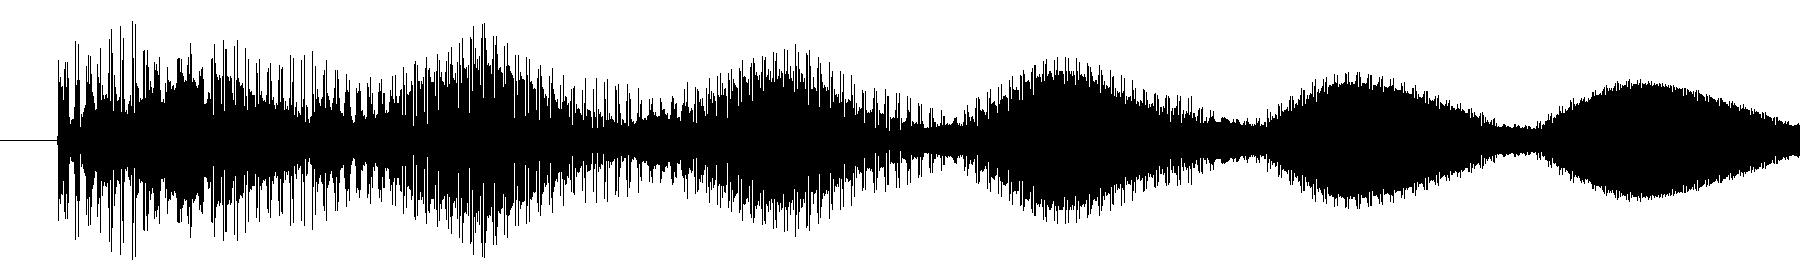 perc 1 5